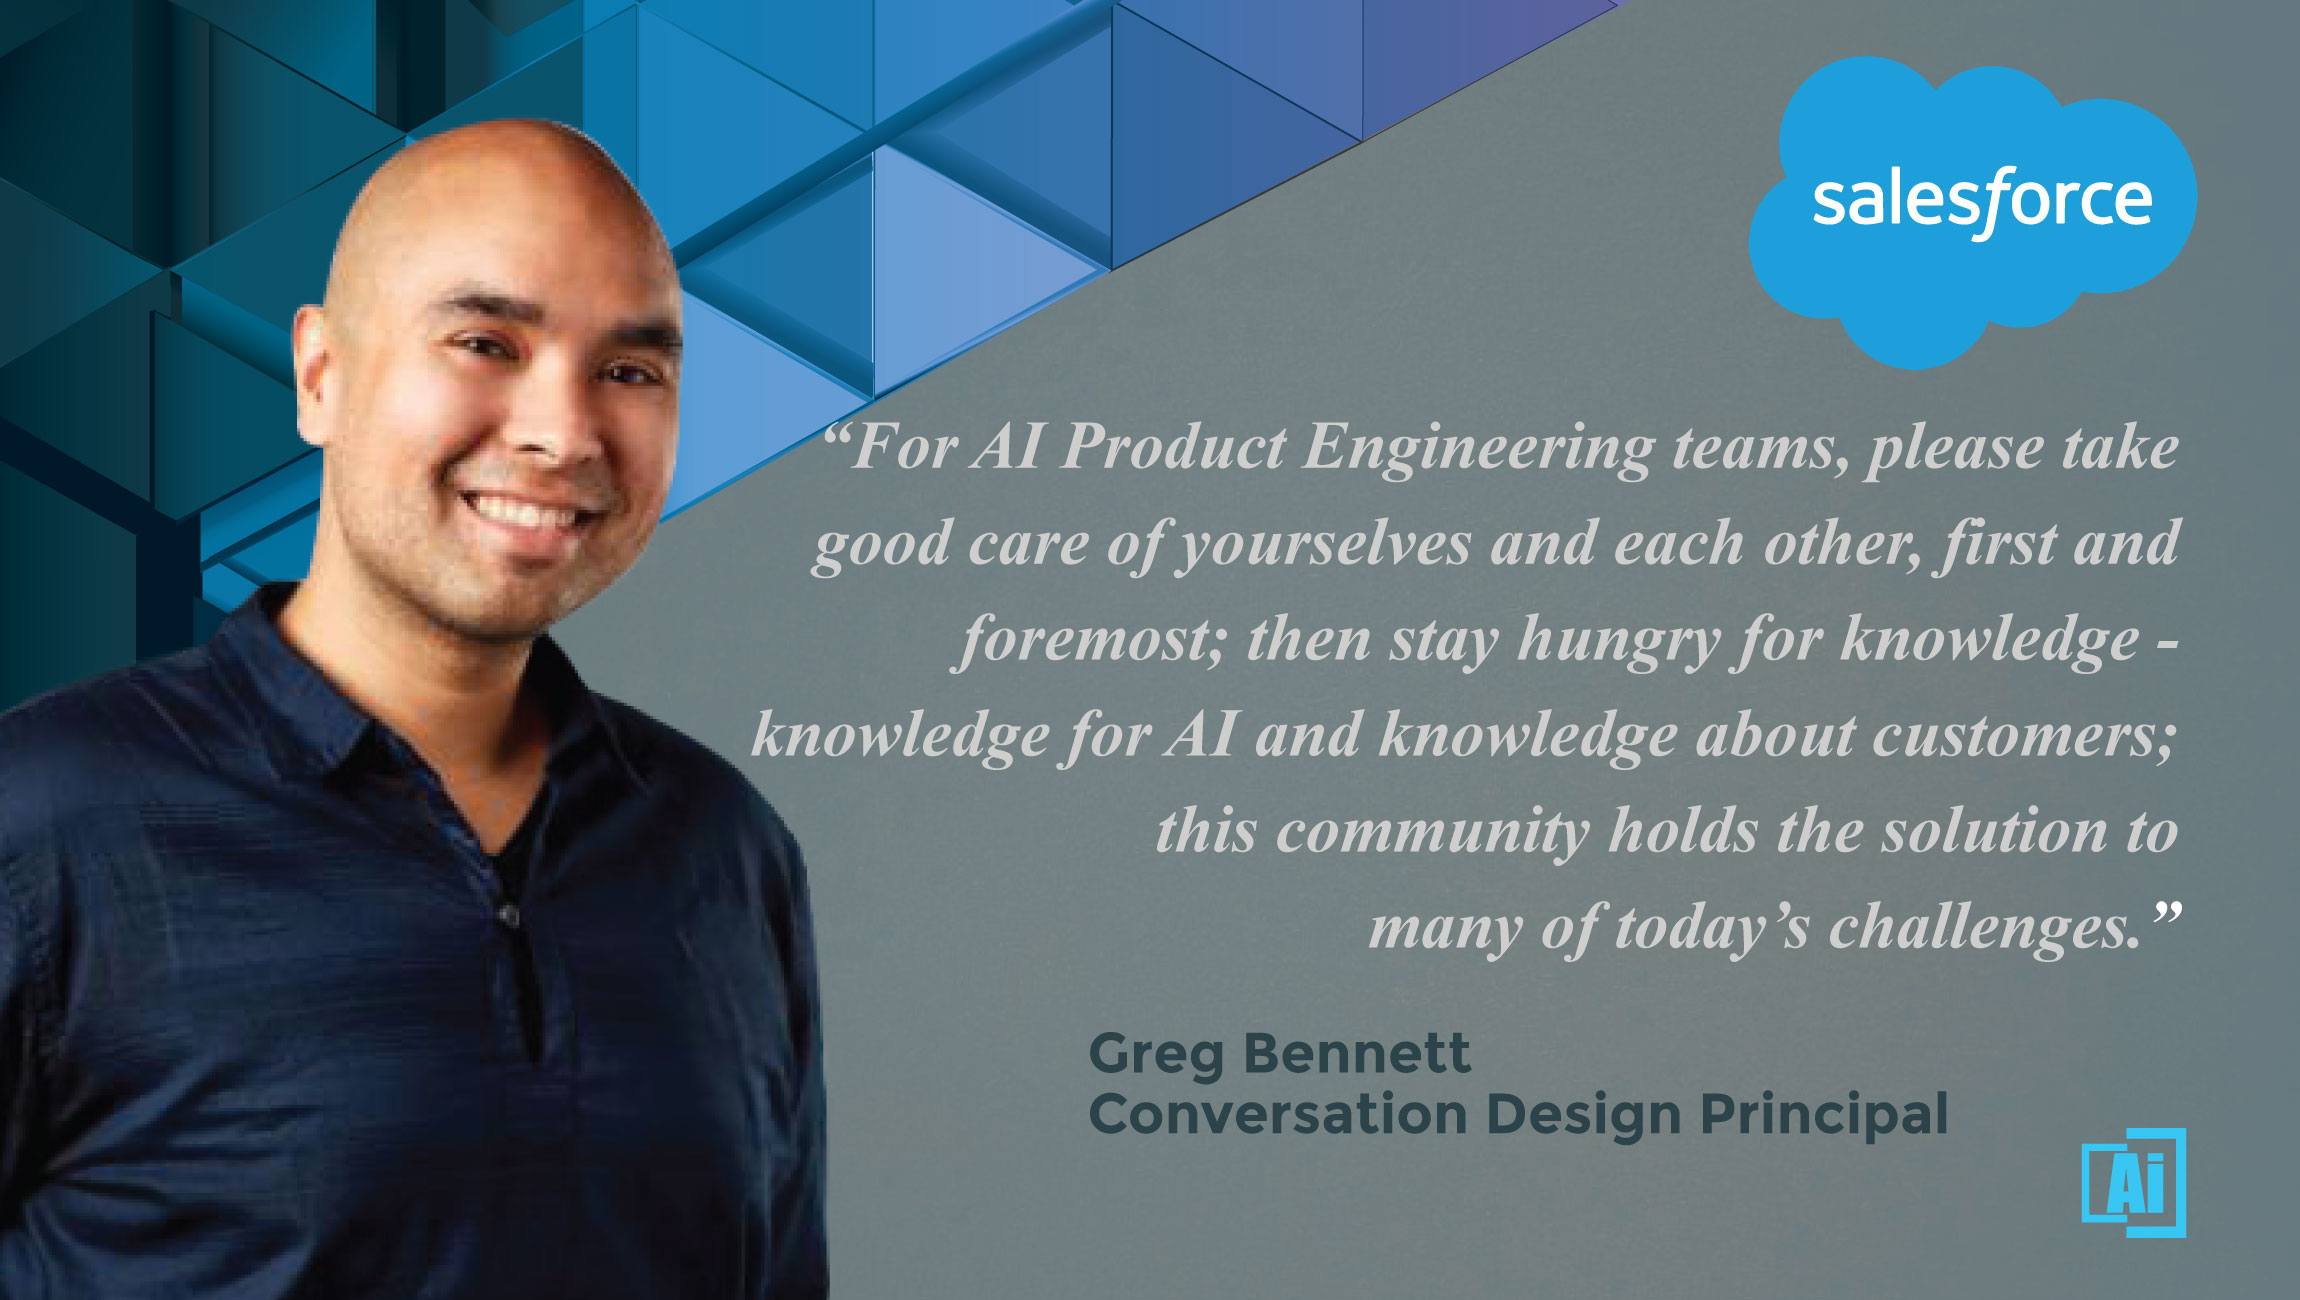 AiThority Interview with Greg Bennett, Conversation Design Lead at Salesforce